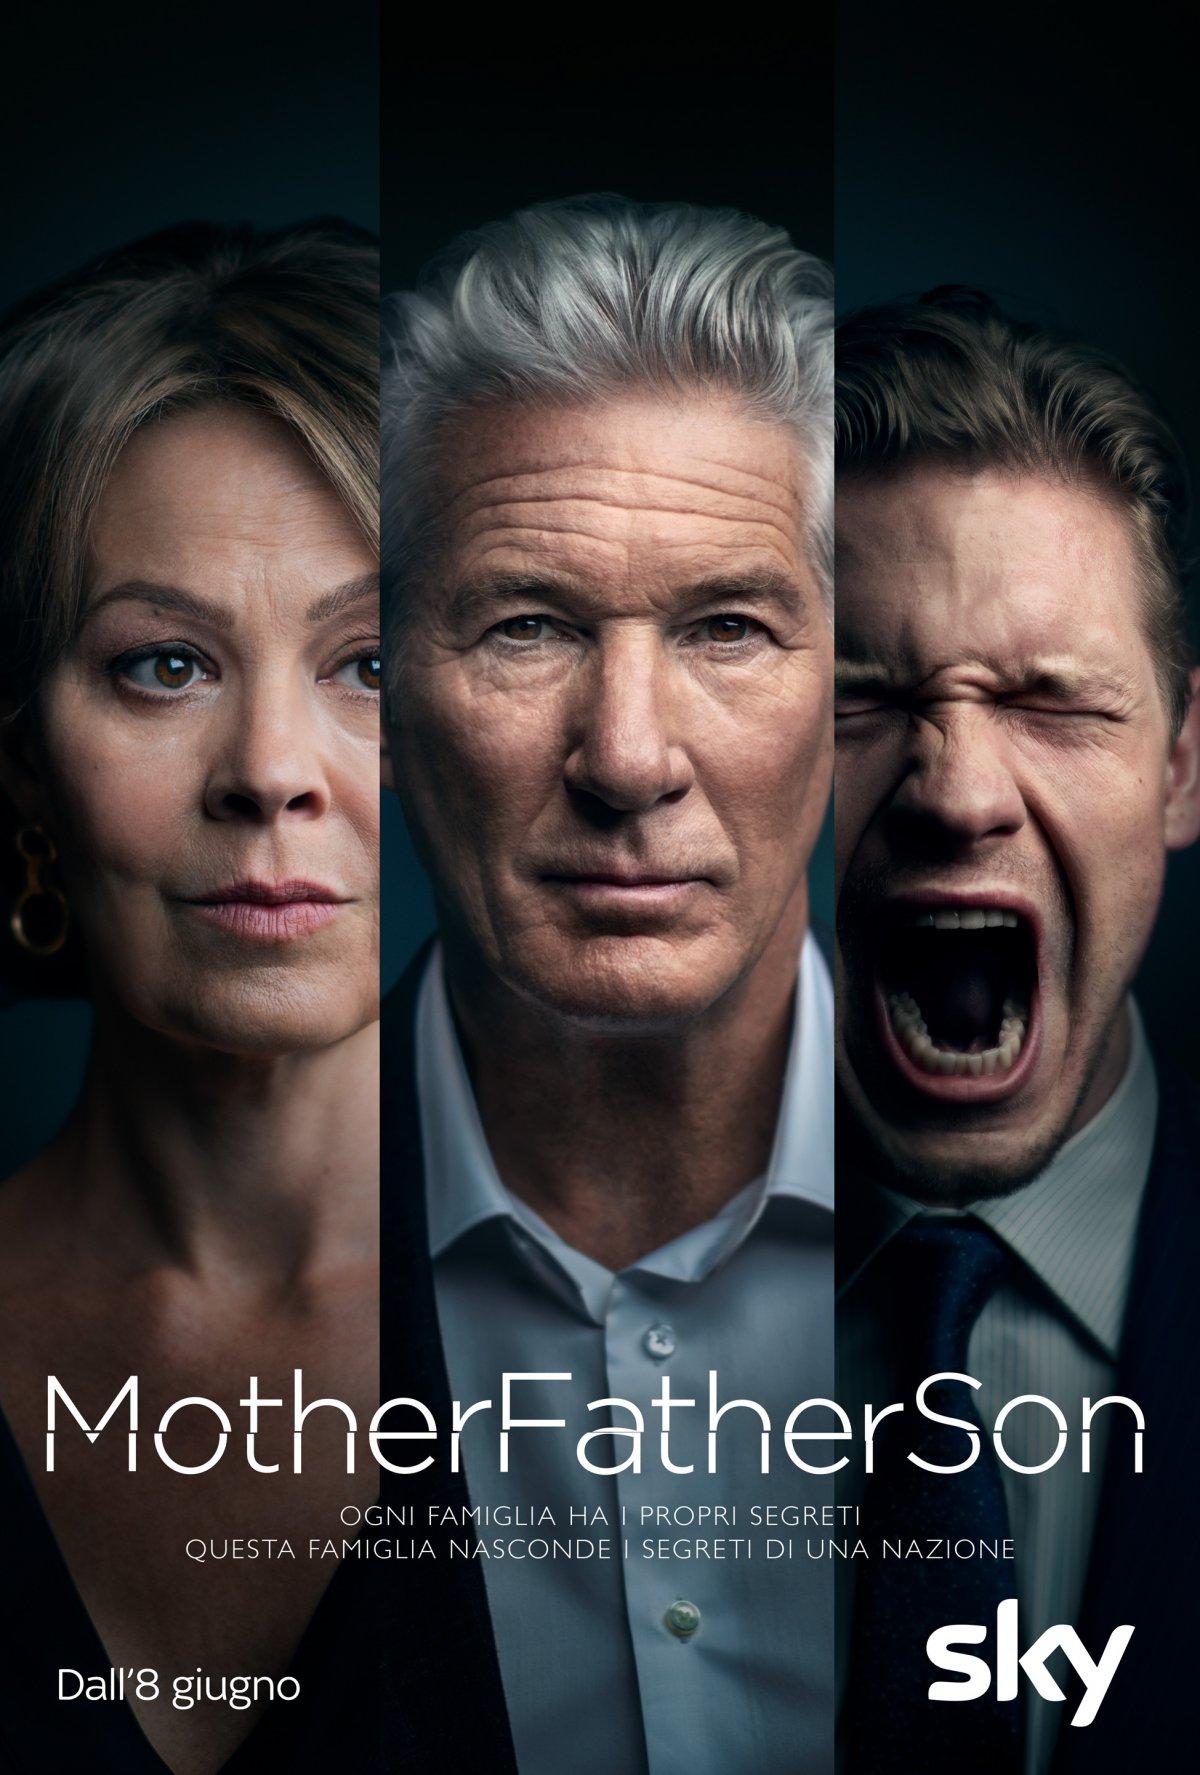 Motherfatherson Trailer